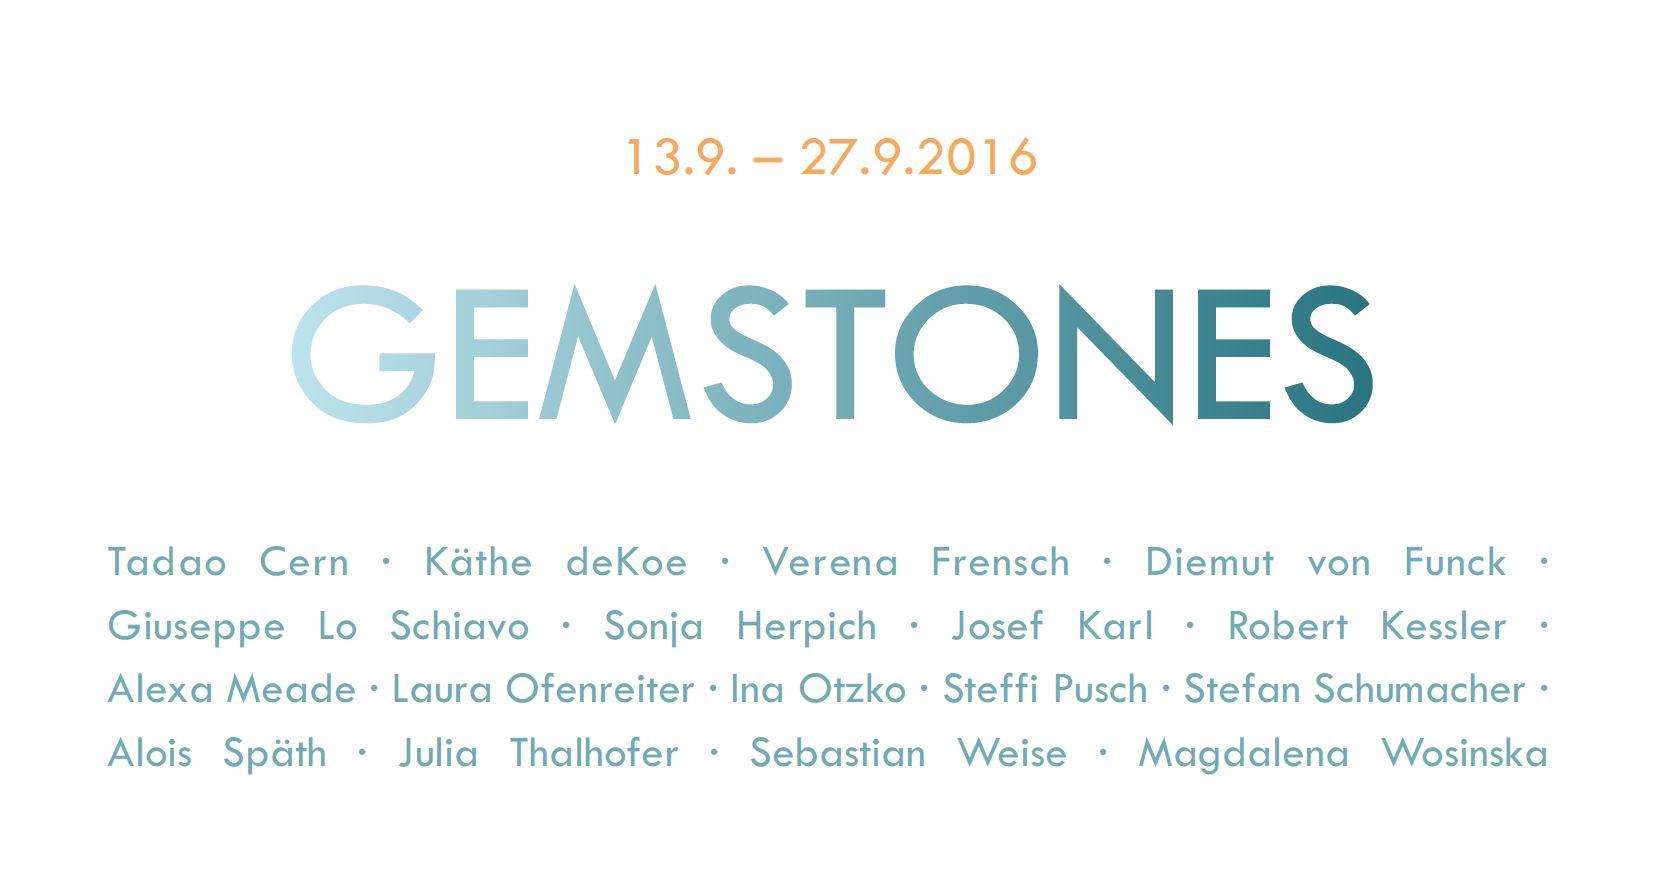 gemstonesws.JPG